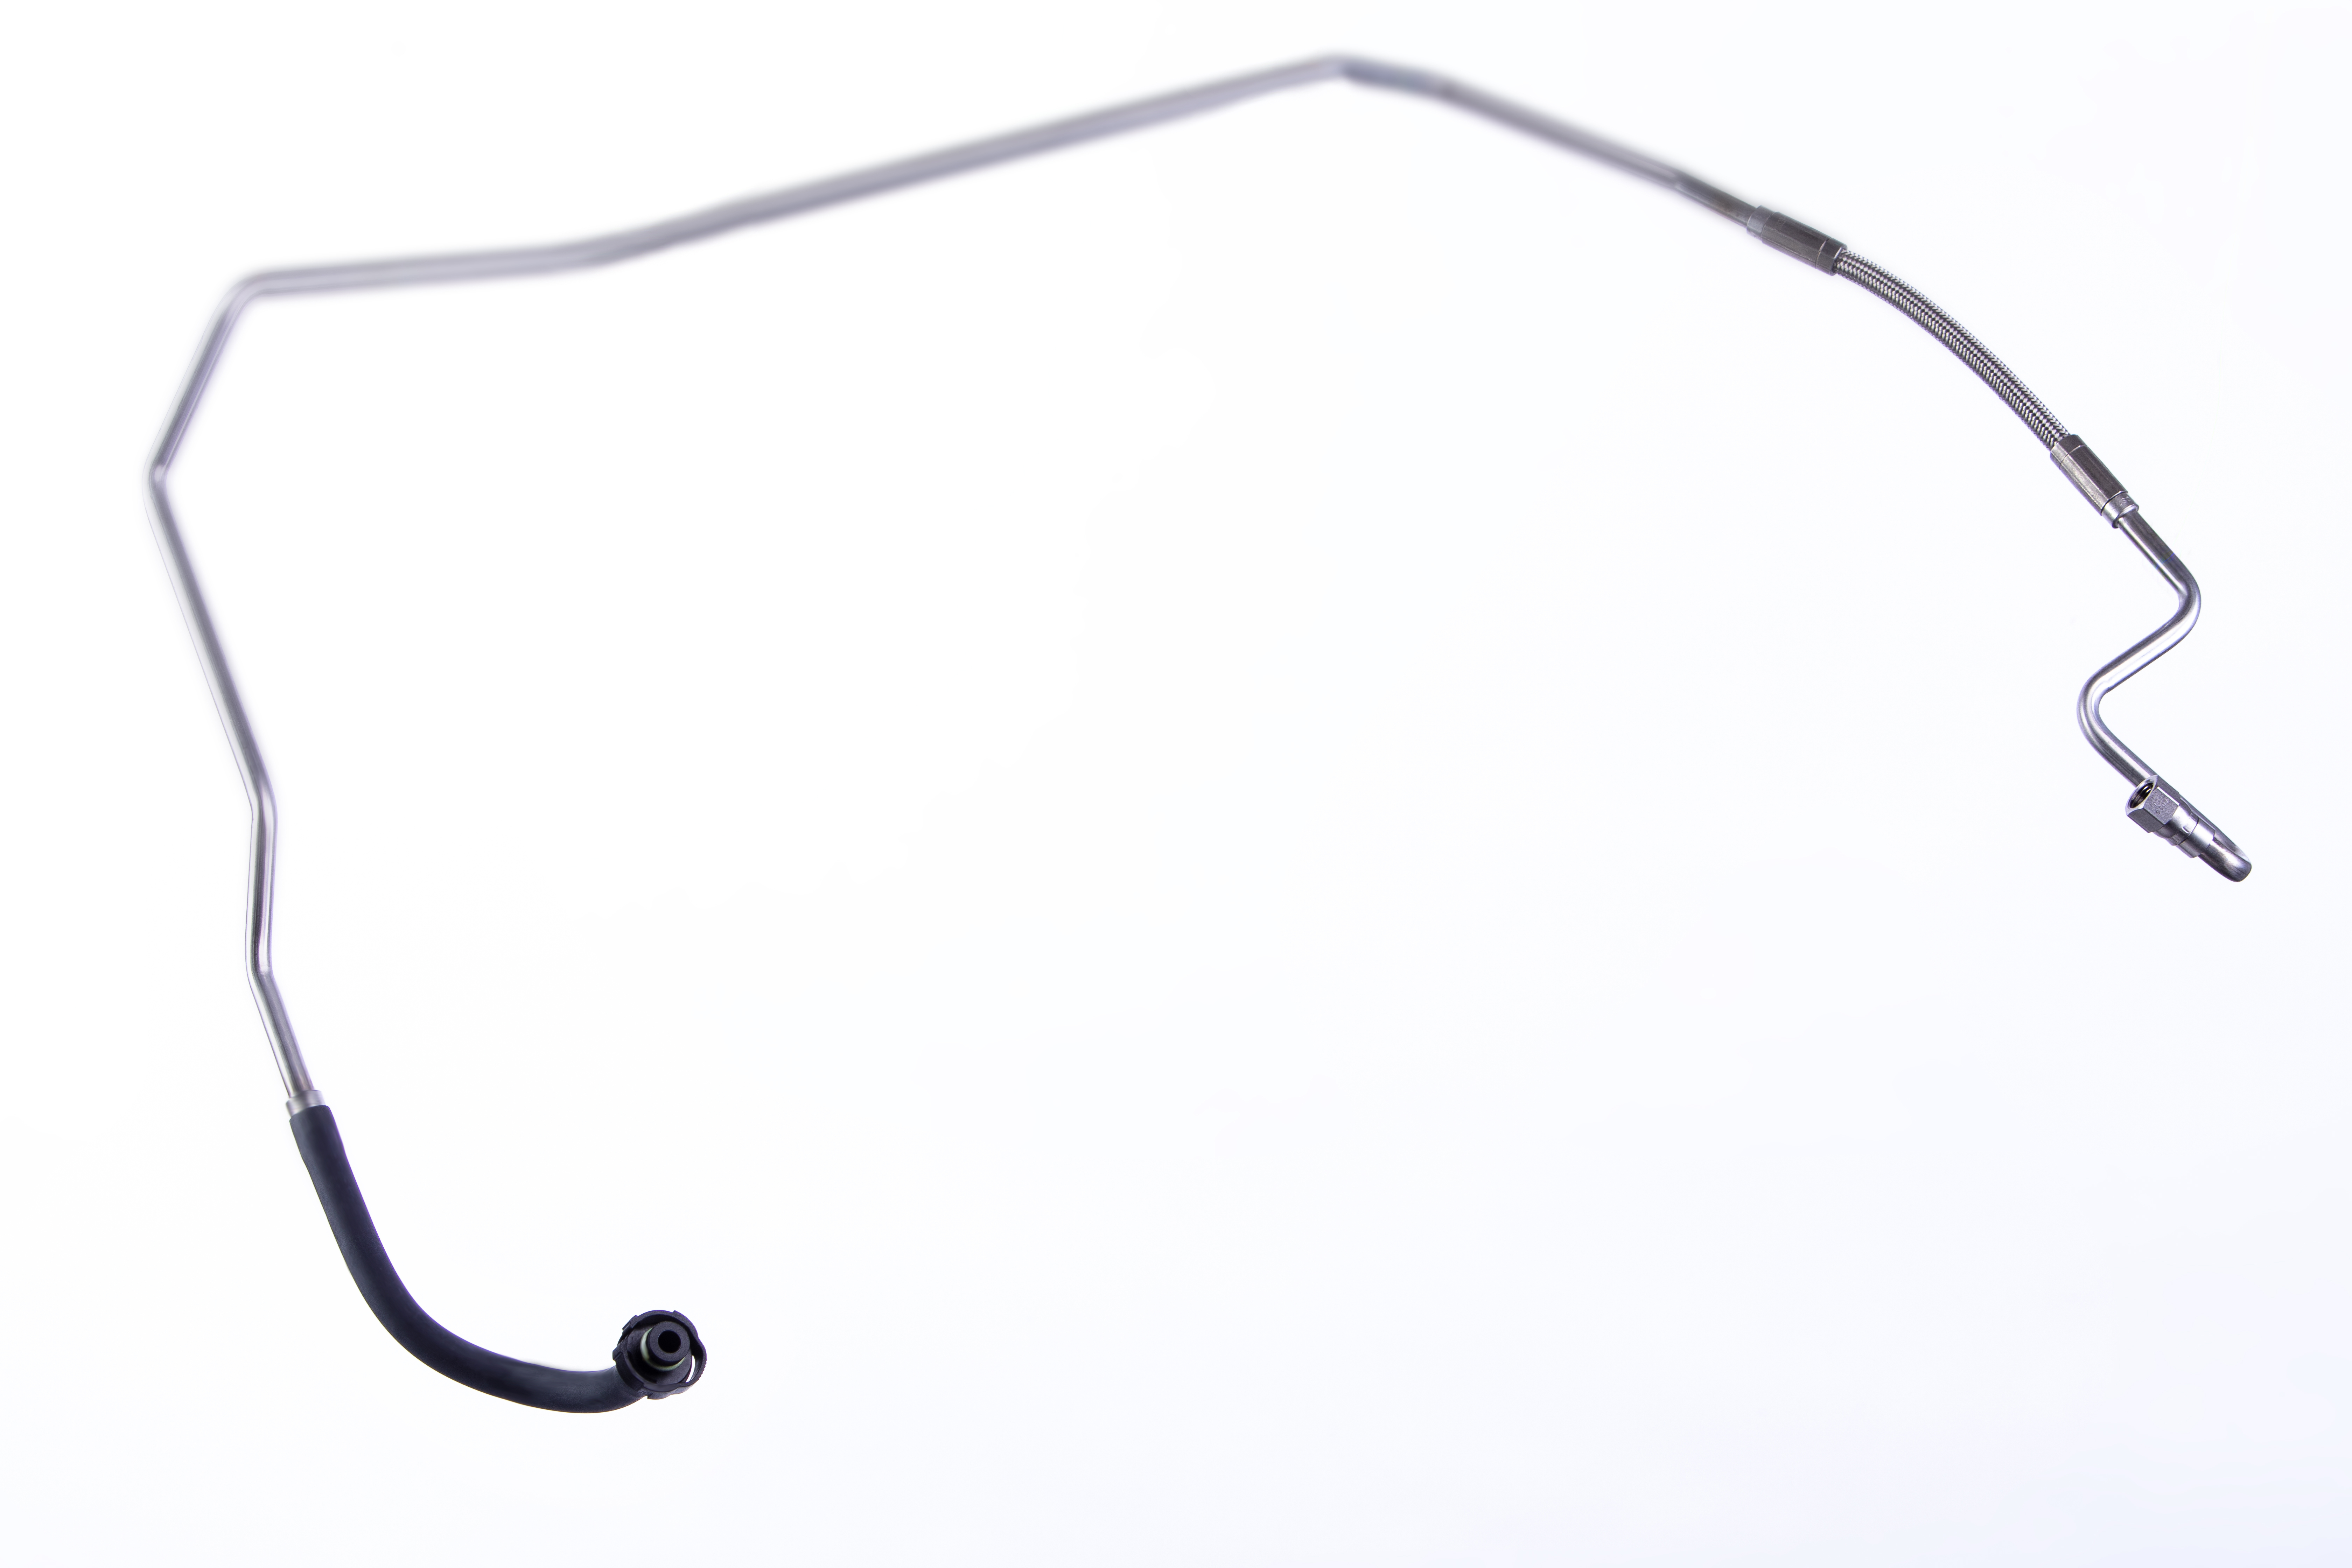 Bild040 Fuel line with steel tube